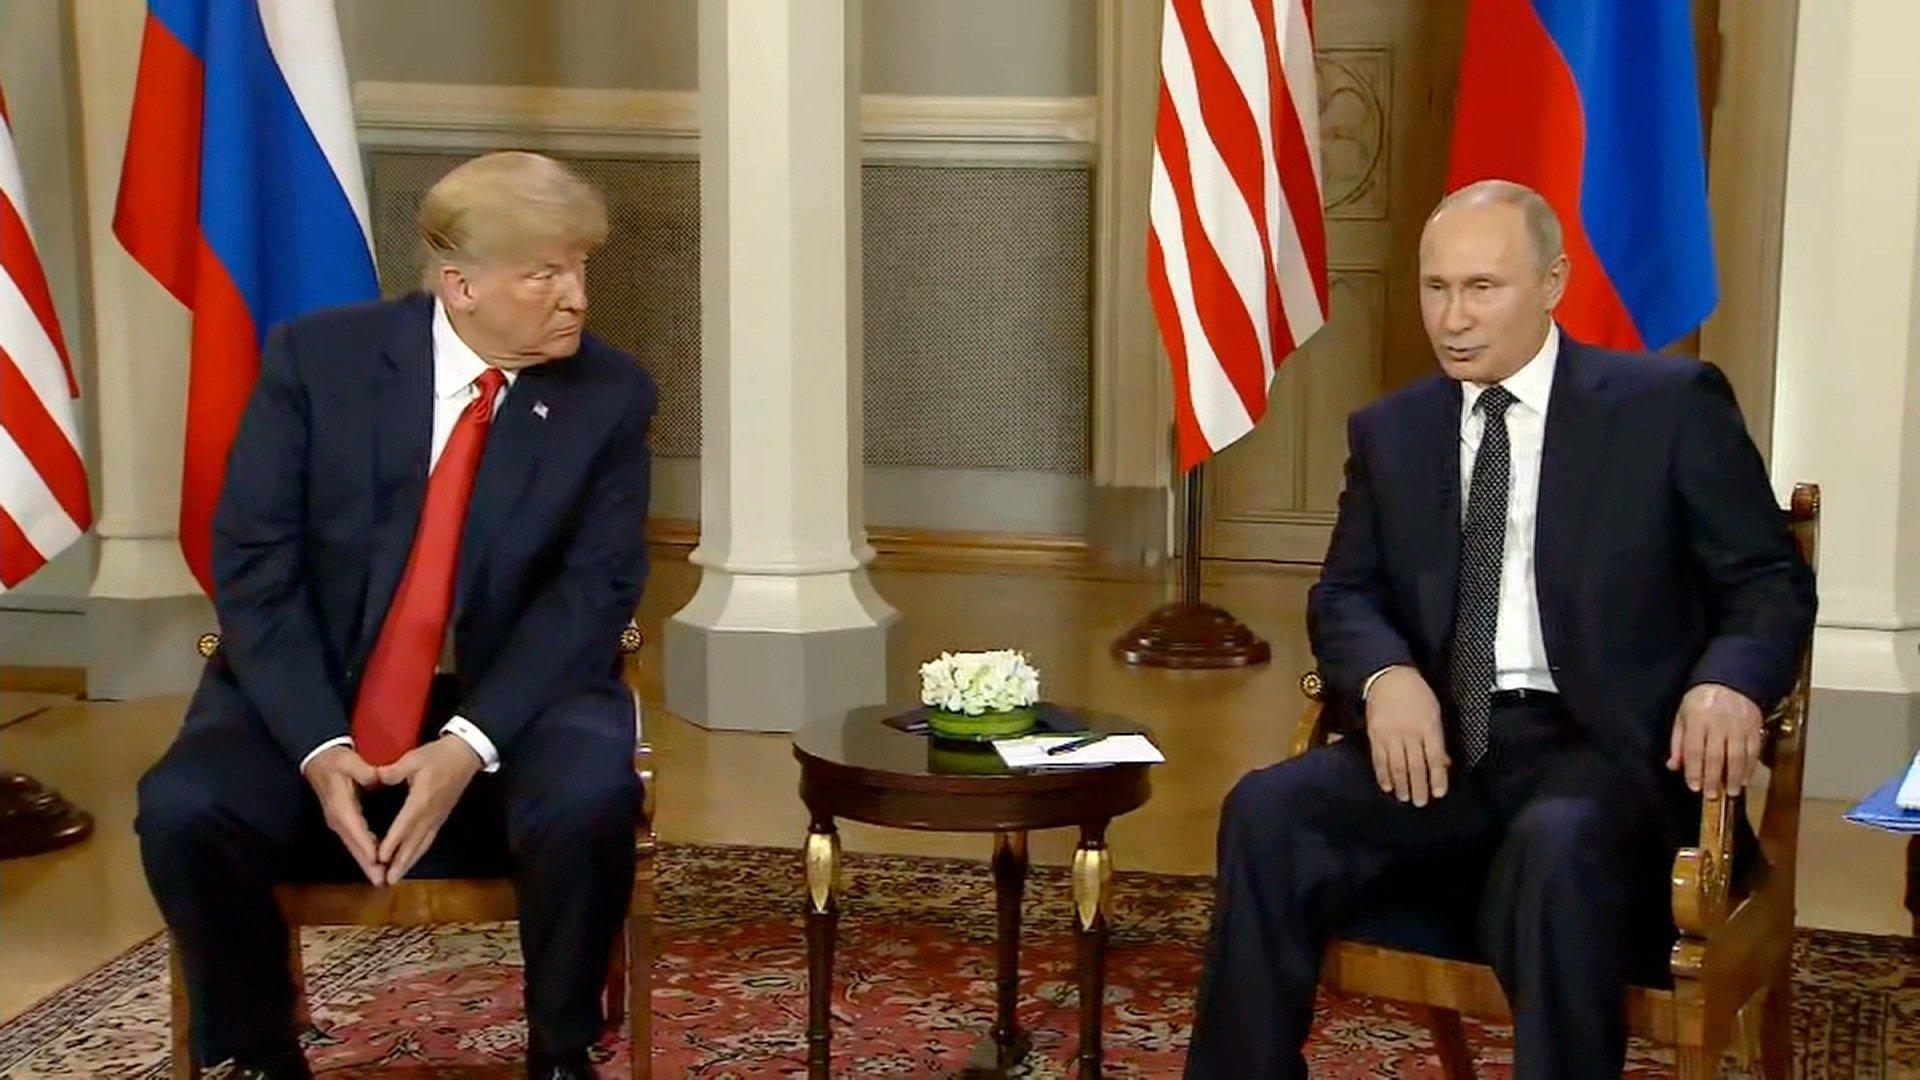 President Trump and Russian President Vladimir Putin speak at a summit in Helsinki, Finland. (POOL photo via CNN)